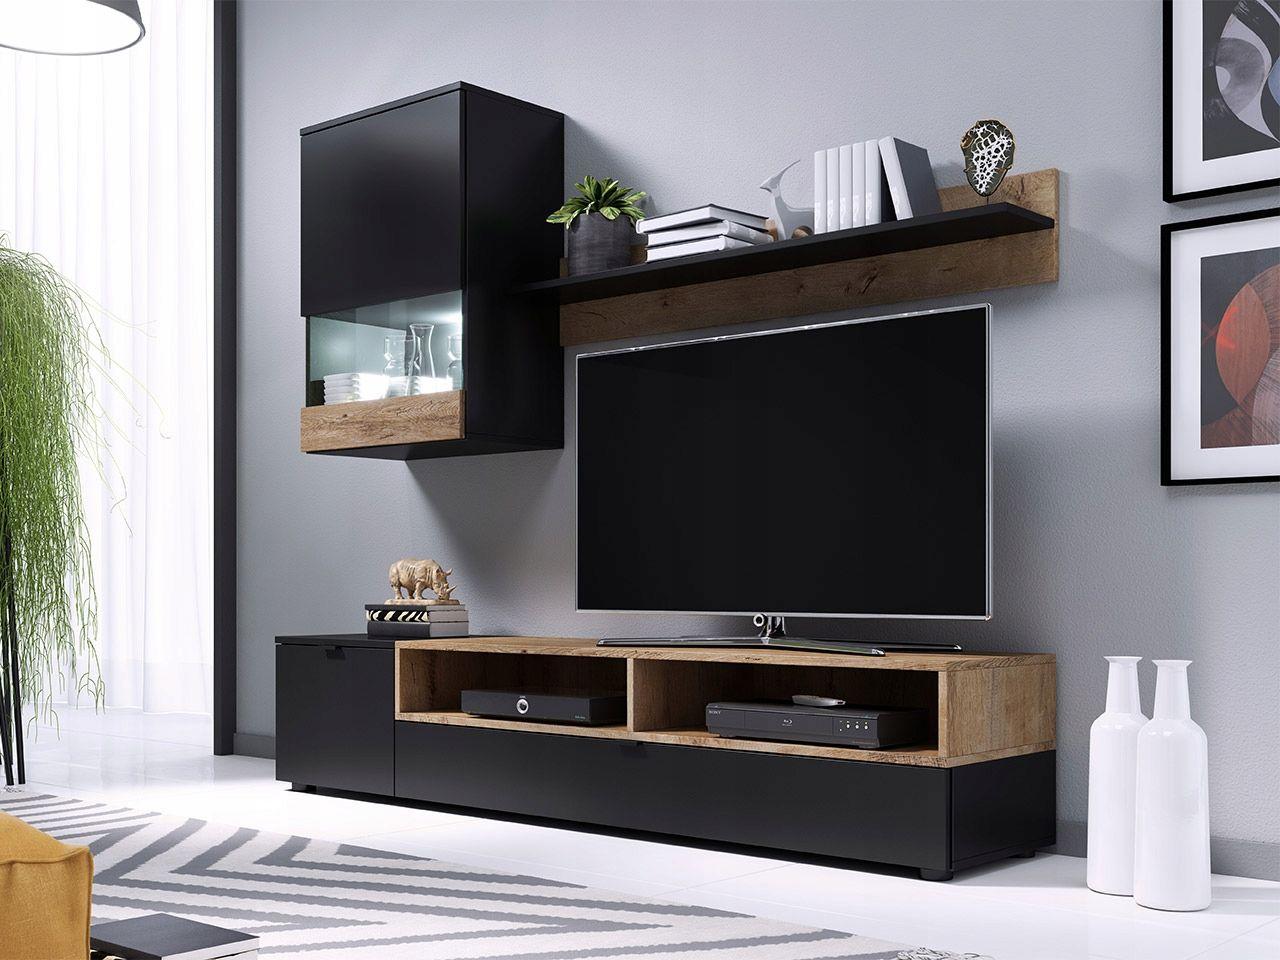 Meble Zestaw Mebli Nowoczesna Mebloscianka Pat Modern Square Coffee Table Living Room Decor Home Decor